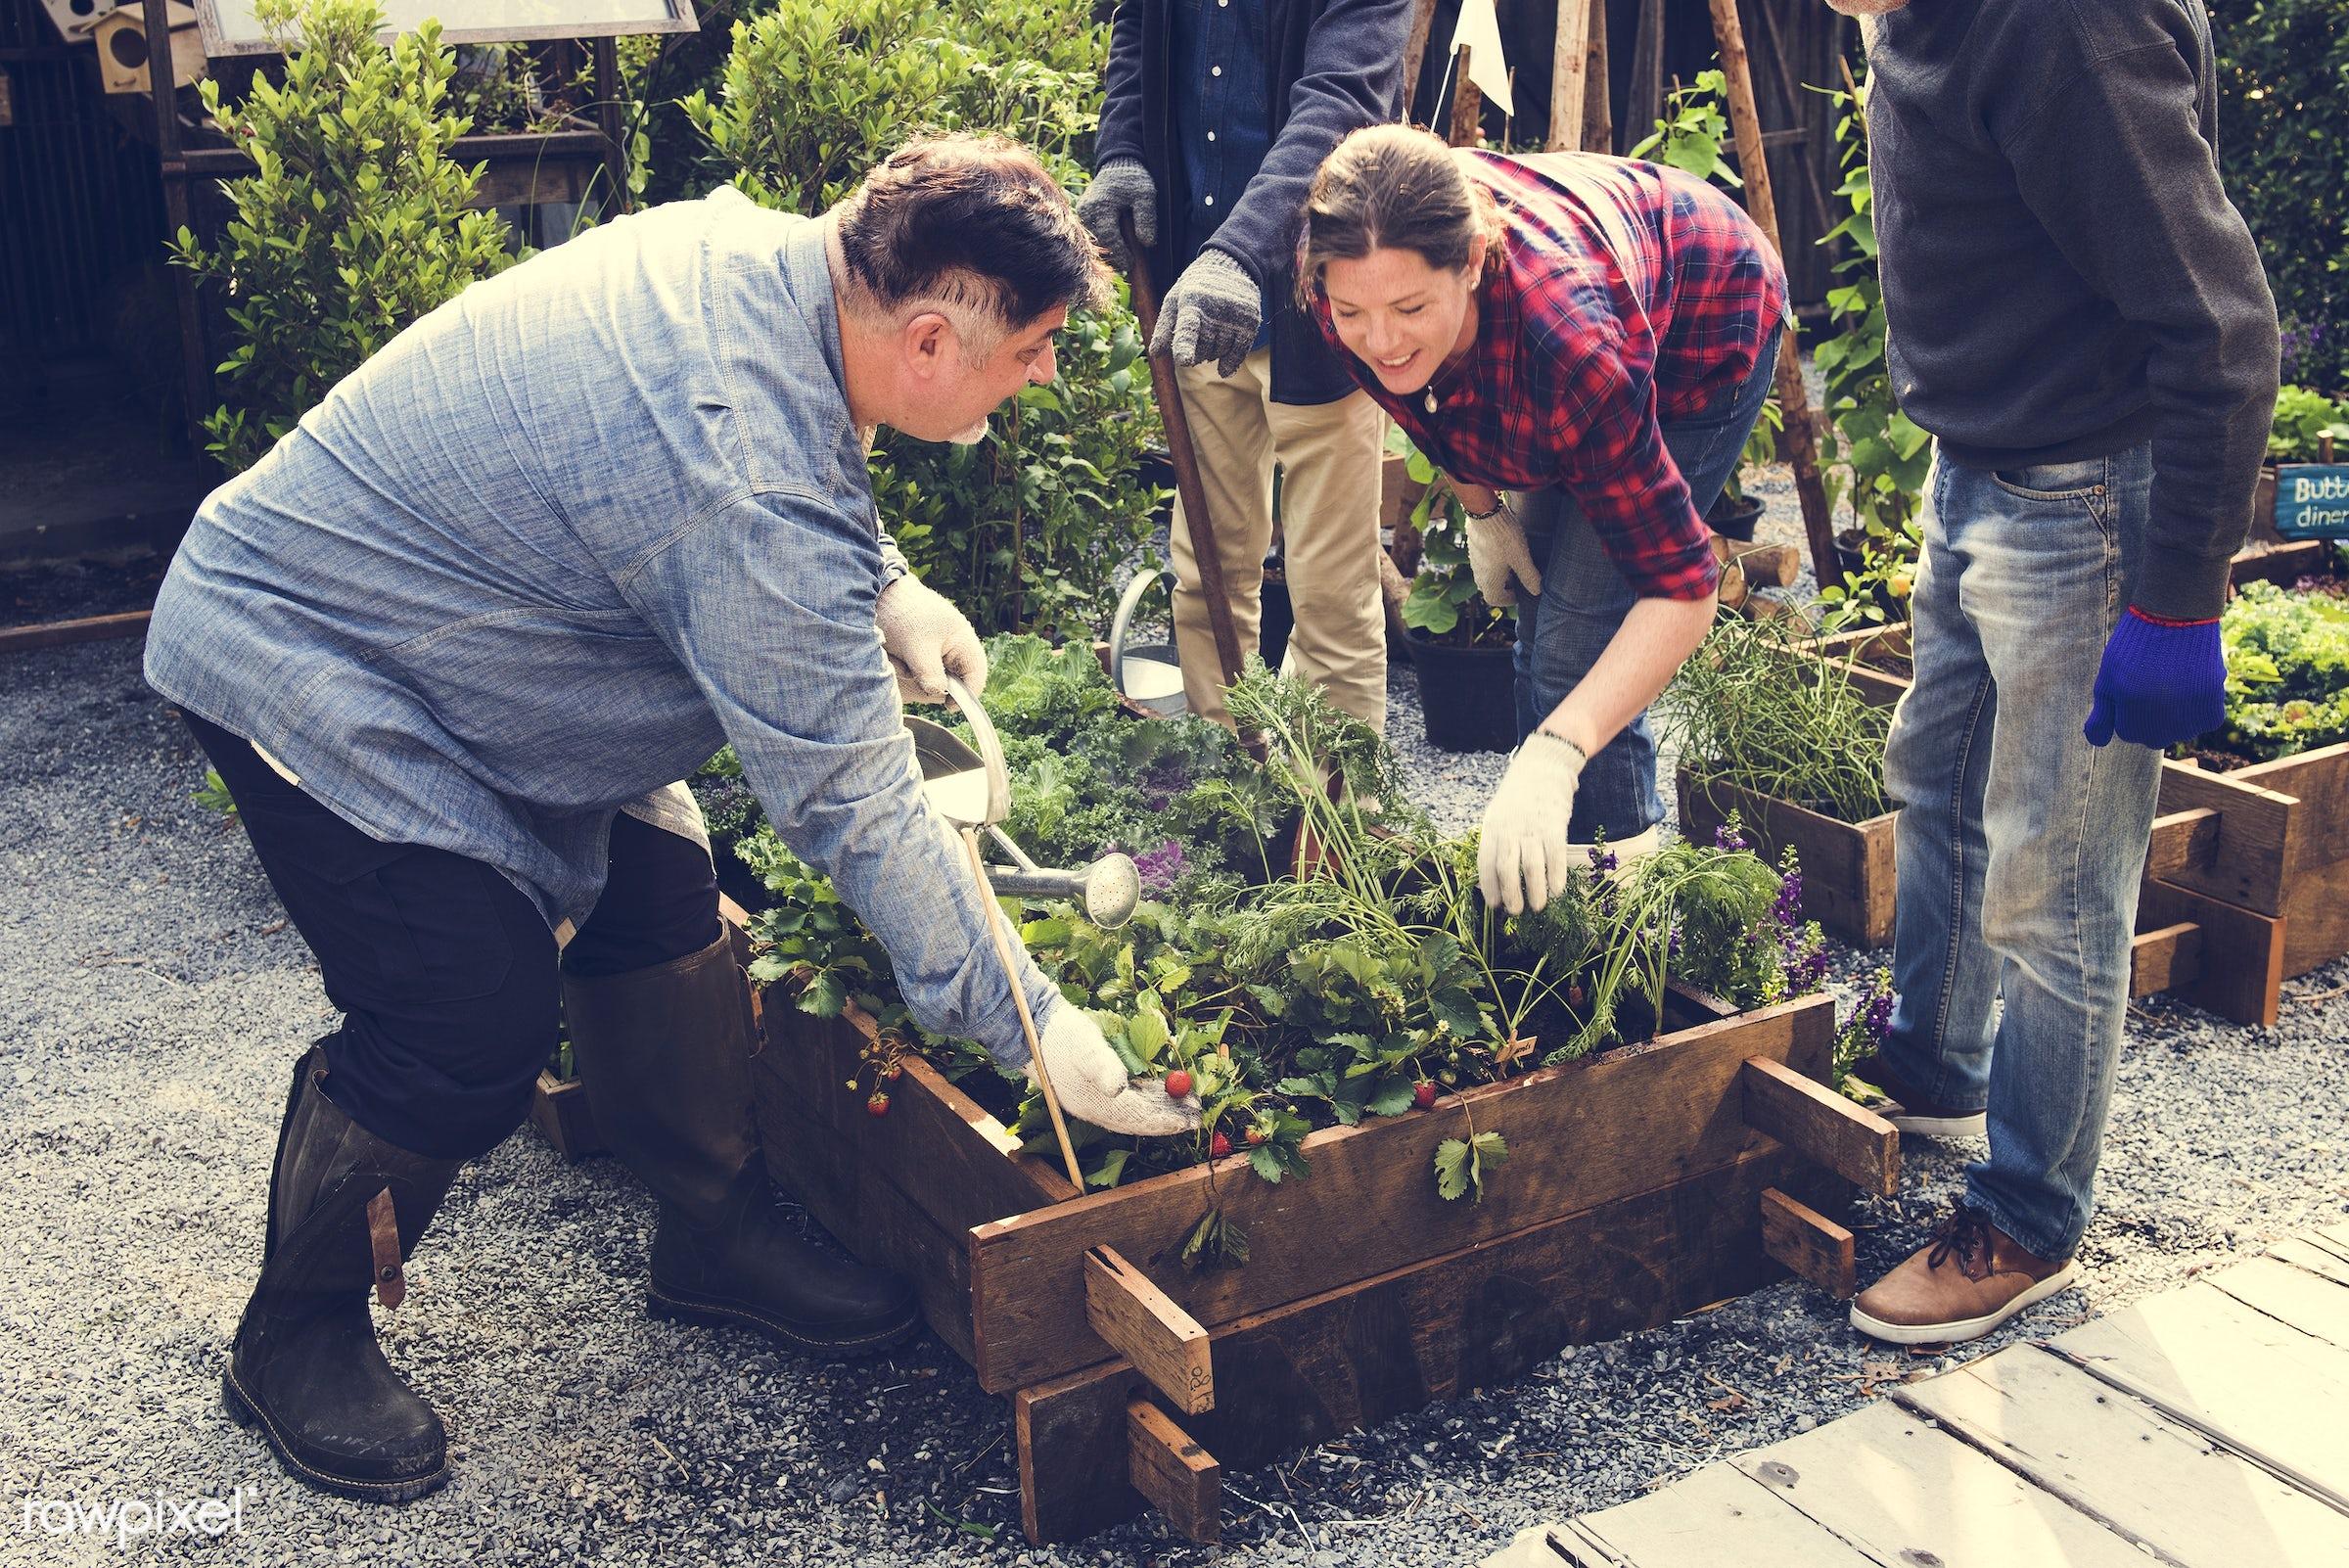 plant, tomato, nutritious, greenhouse, friends, farmer, fresh, lettuce, healthy eating, friendship, men, flower, diversity,...